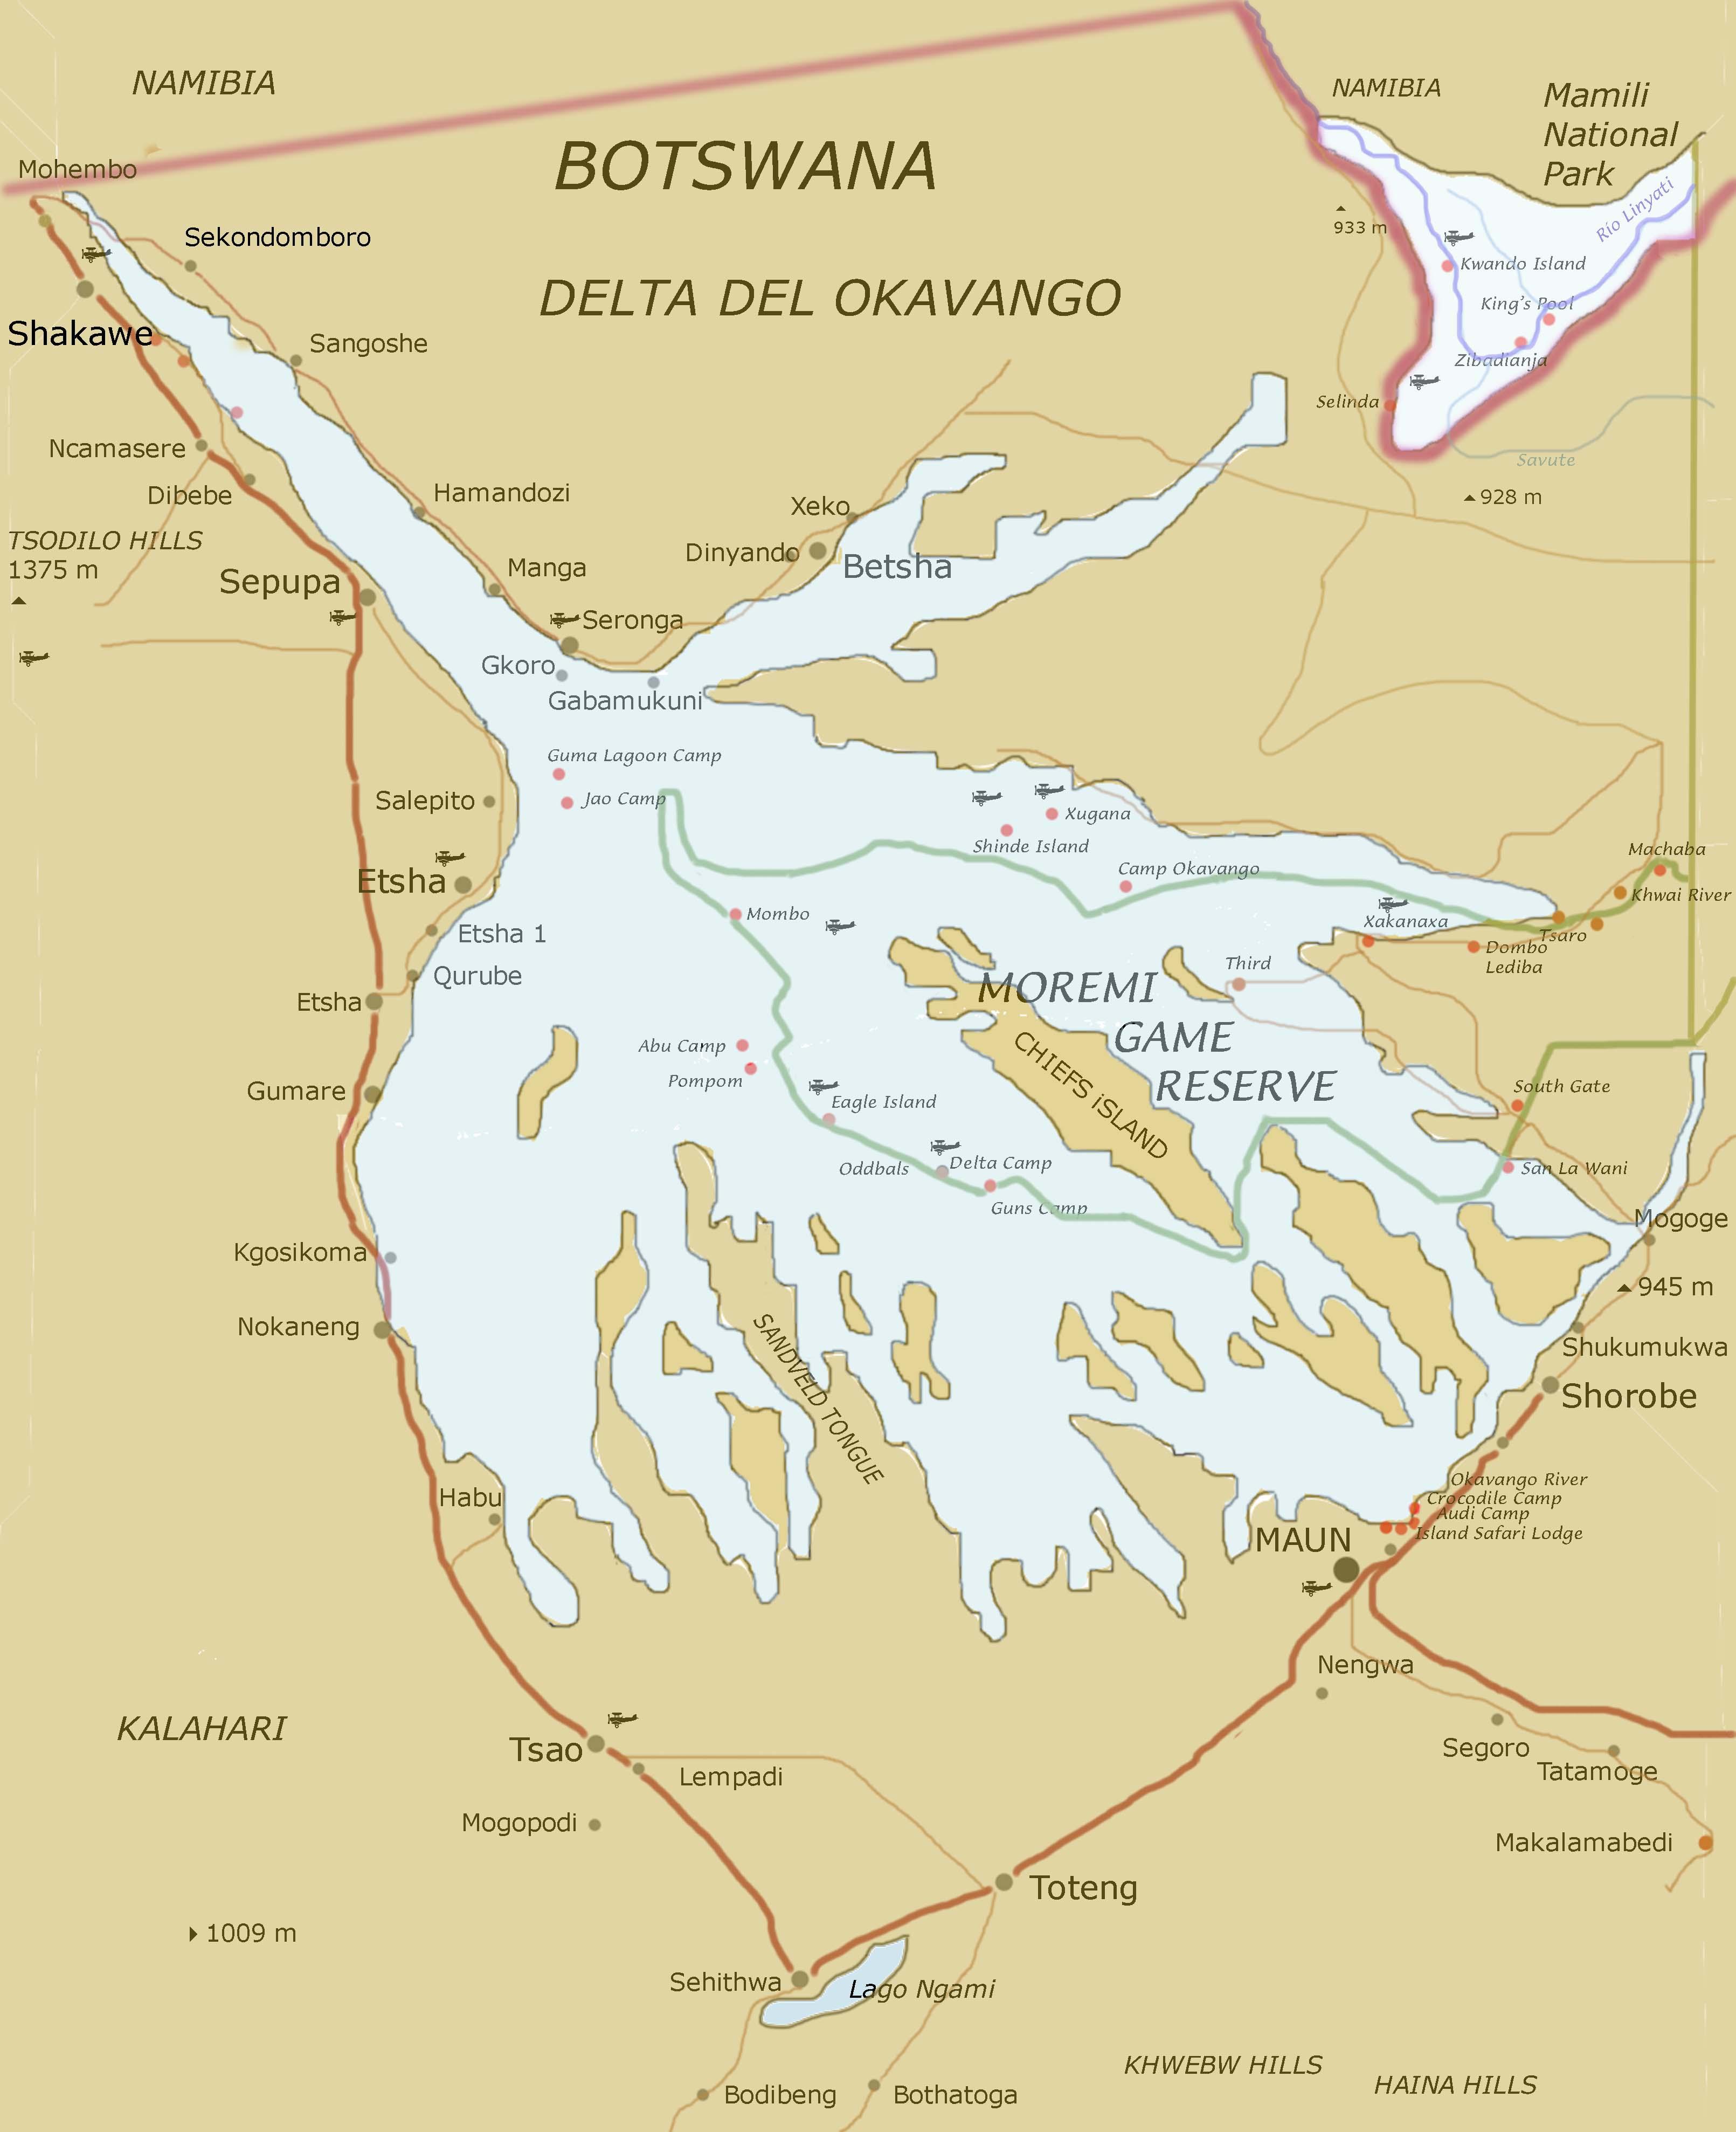 botswana karte Map of Botswana (Map of Okavango Delta) : Worldofmaps.  online